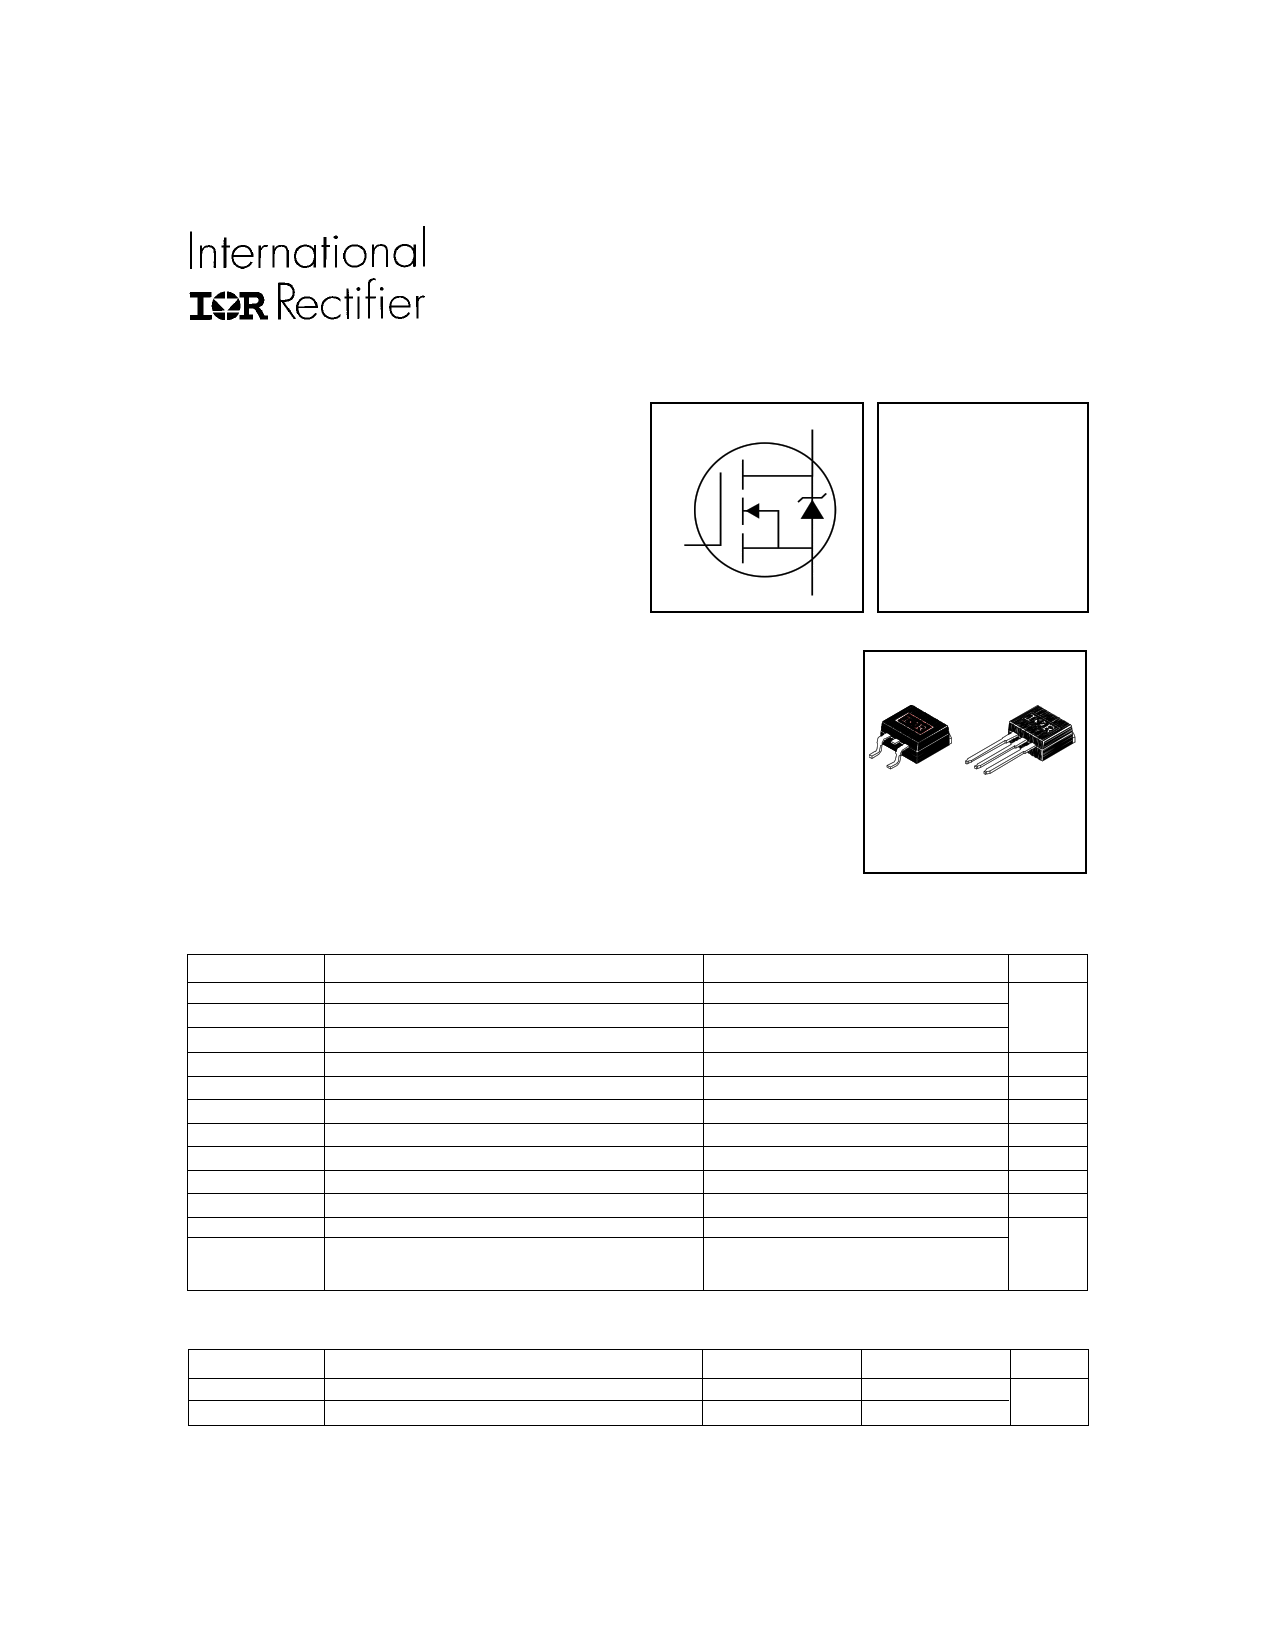 IRFZ48NL Datasheet, IRFZ48NL PDF,ピン配置, 機能